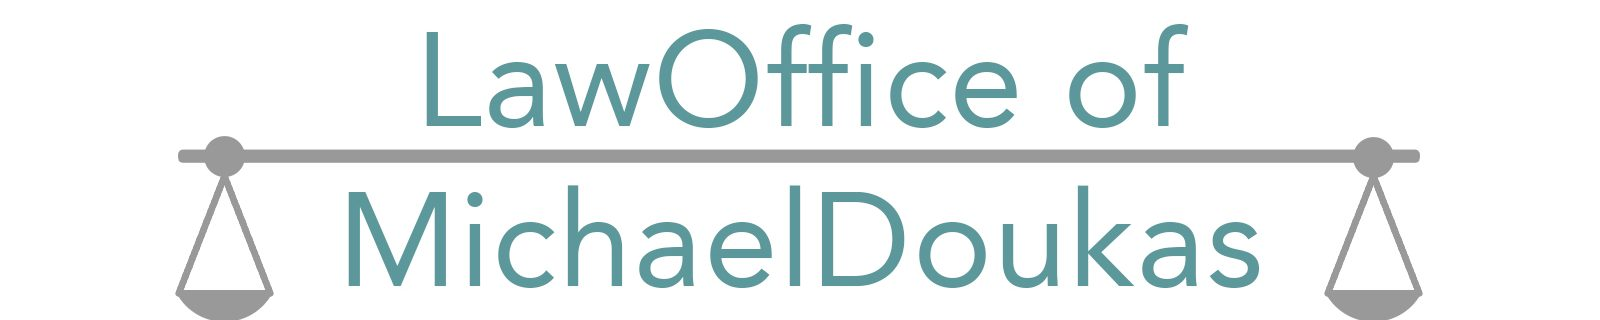 LawOffice of MichaelDoukas